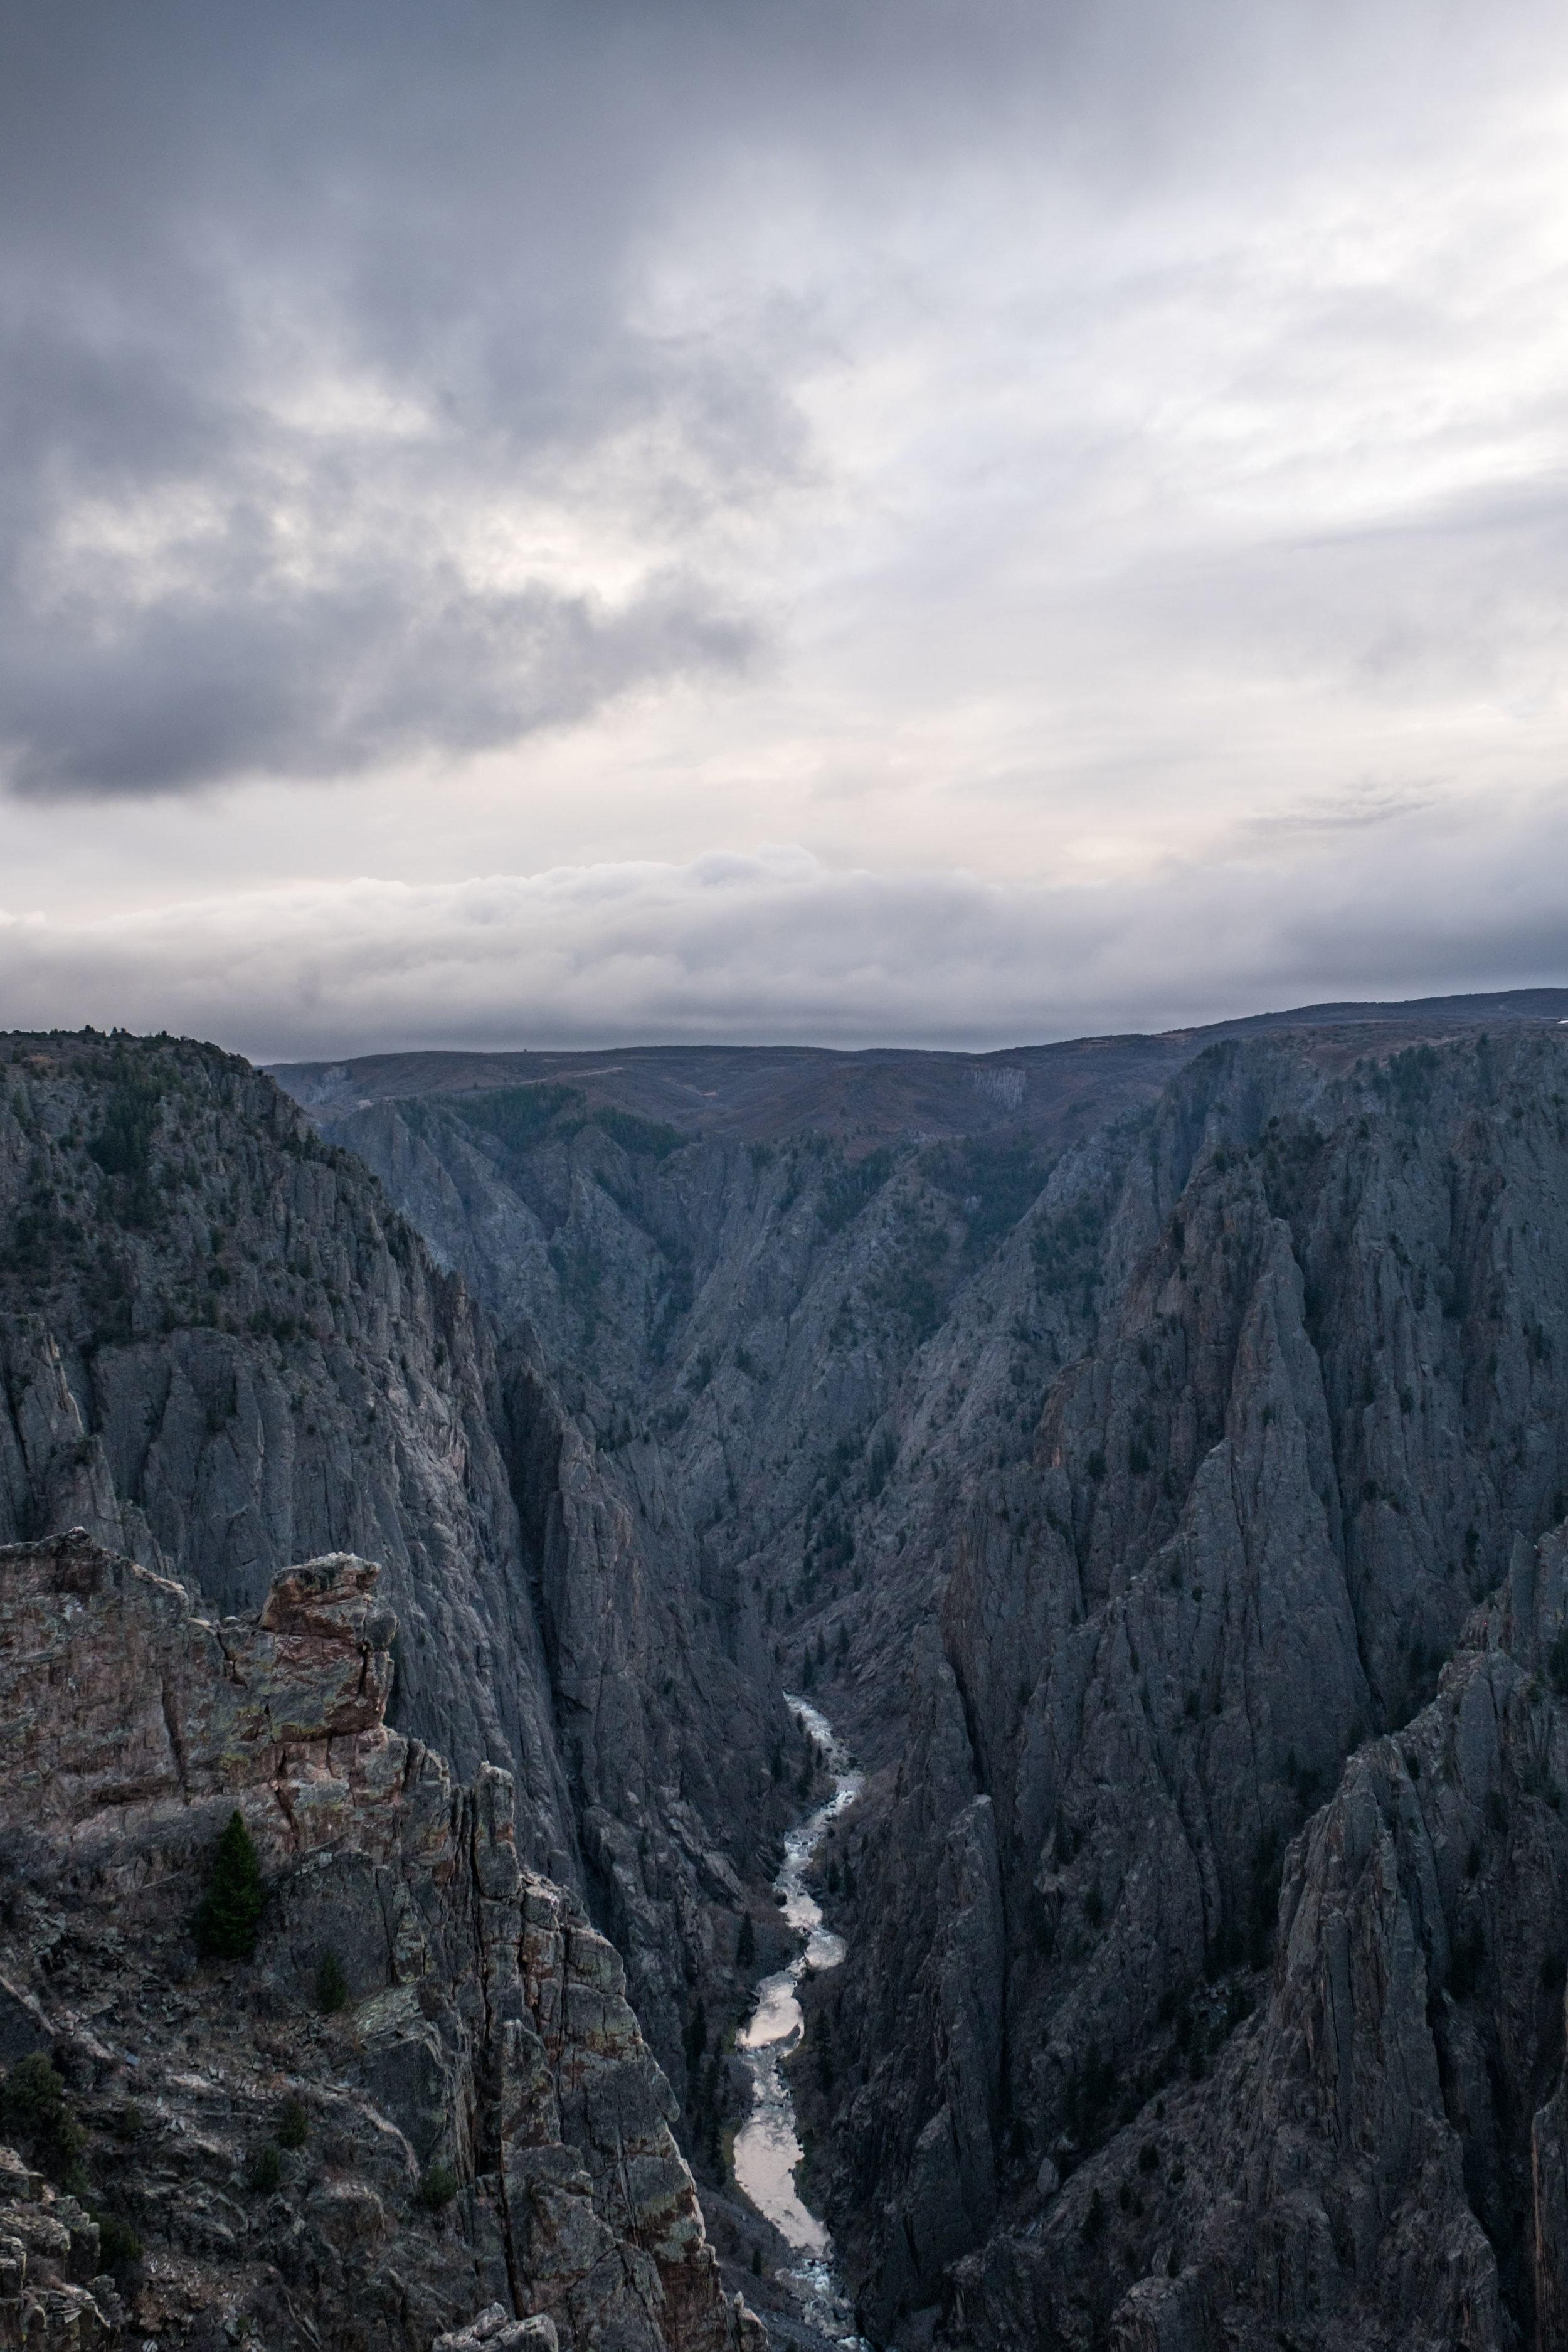 Black Canyon of the Gunnison National Park - 046.jpg